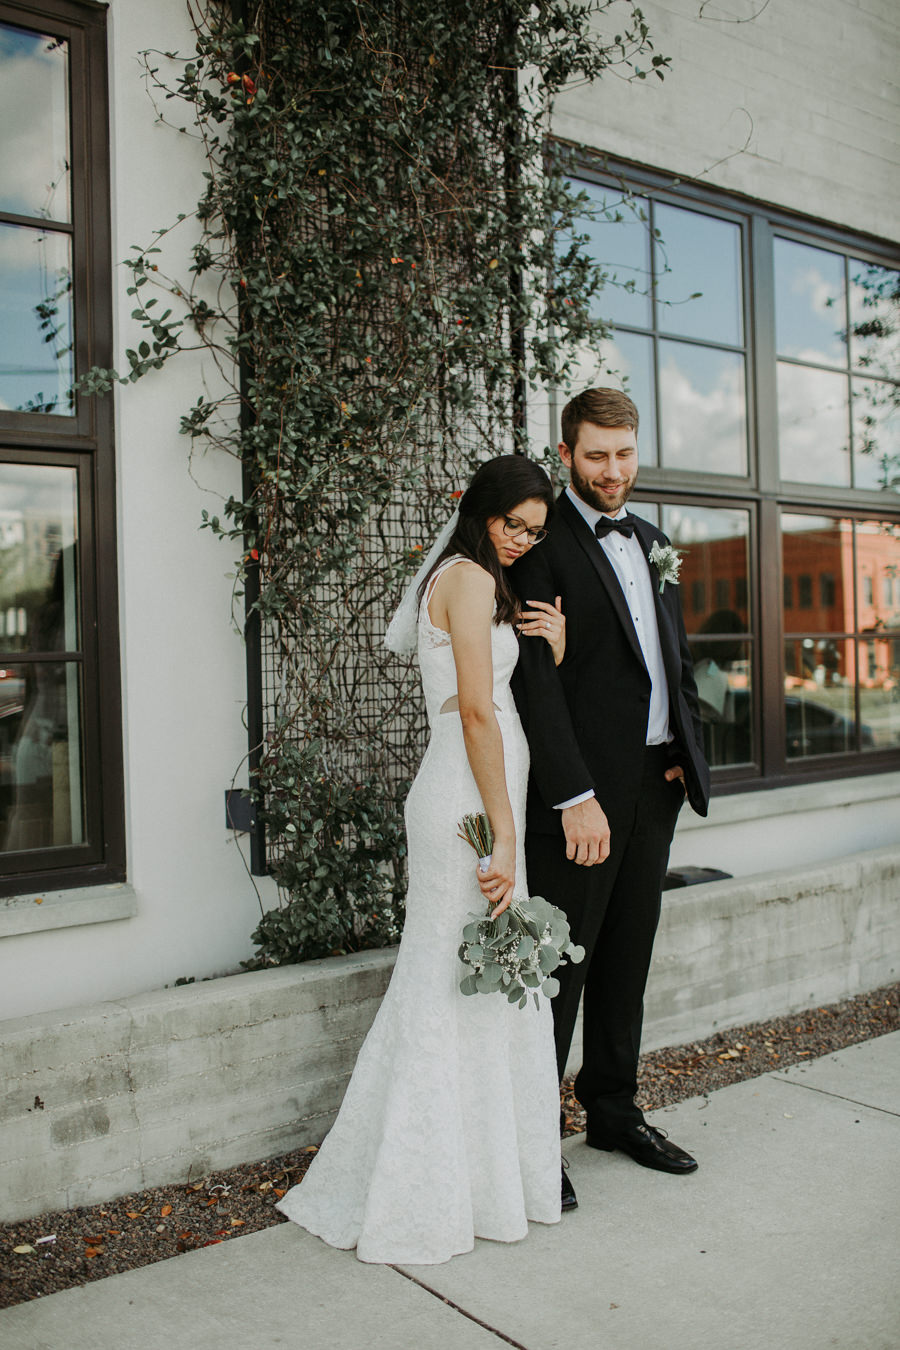 Tampa Heights Industrial Wedding at Cavu Emmy RJ-118.jpg